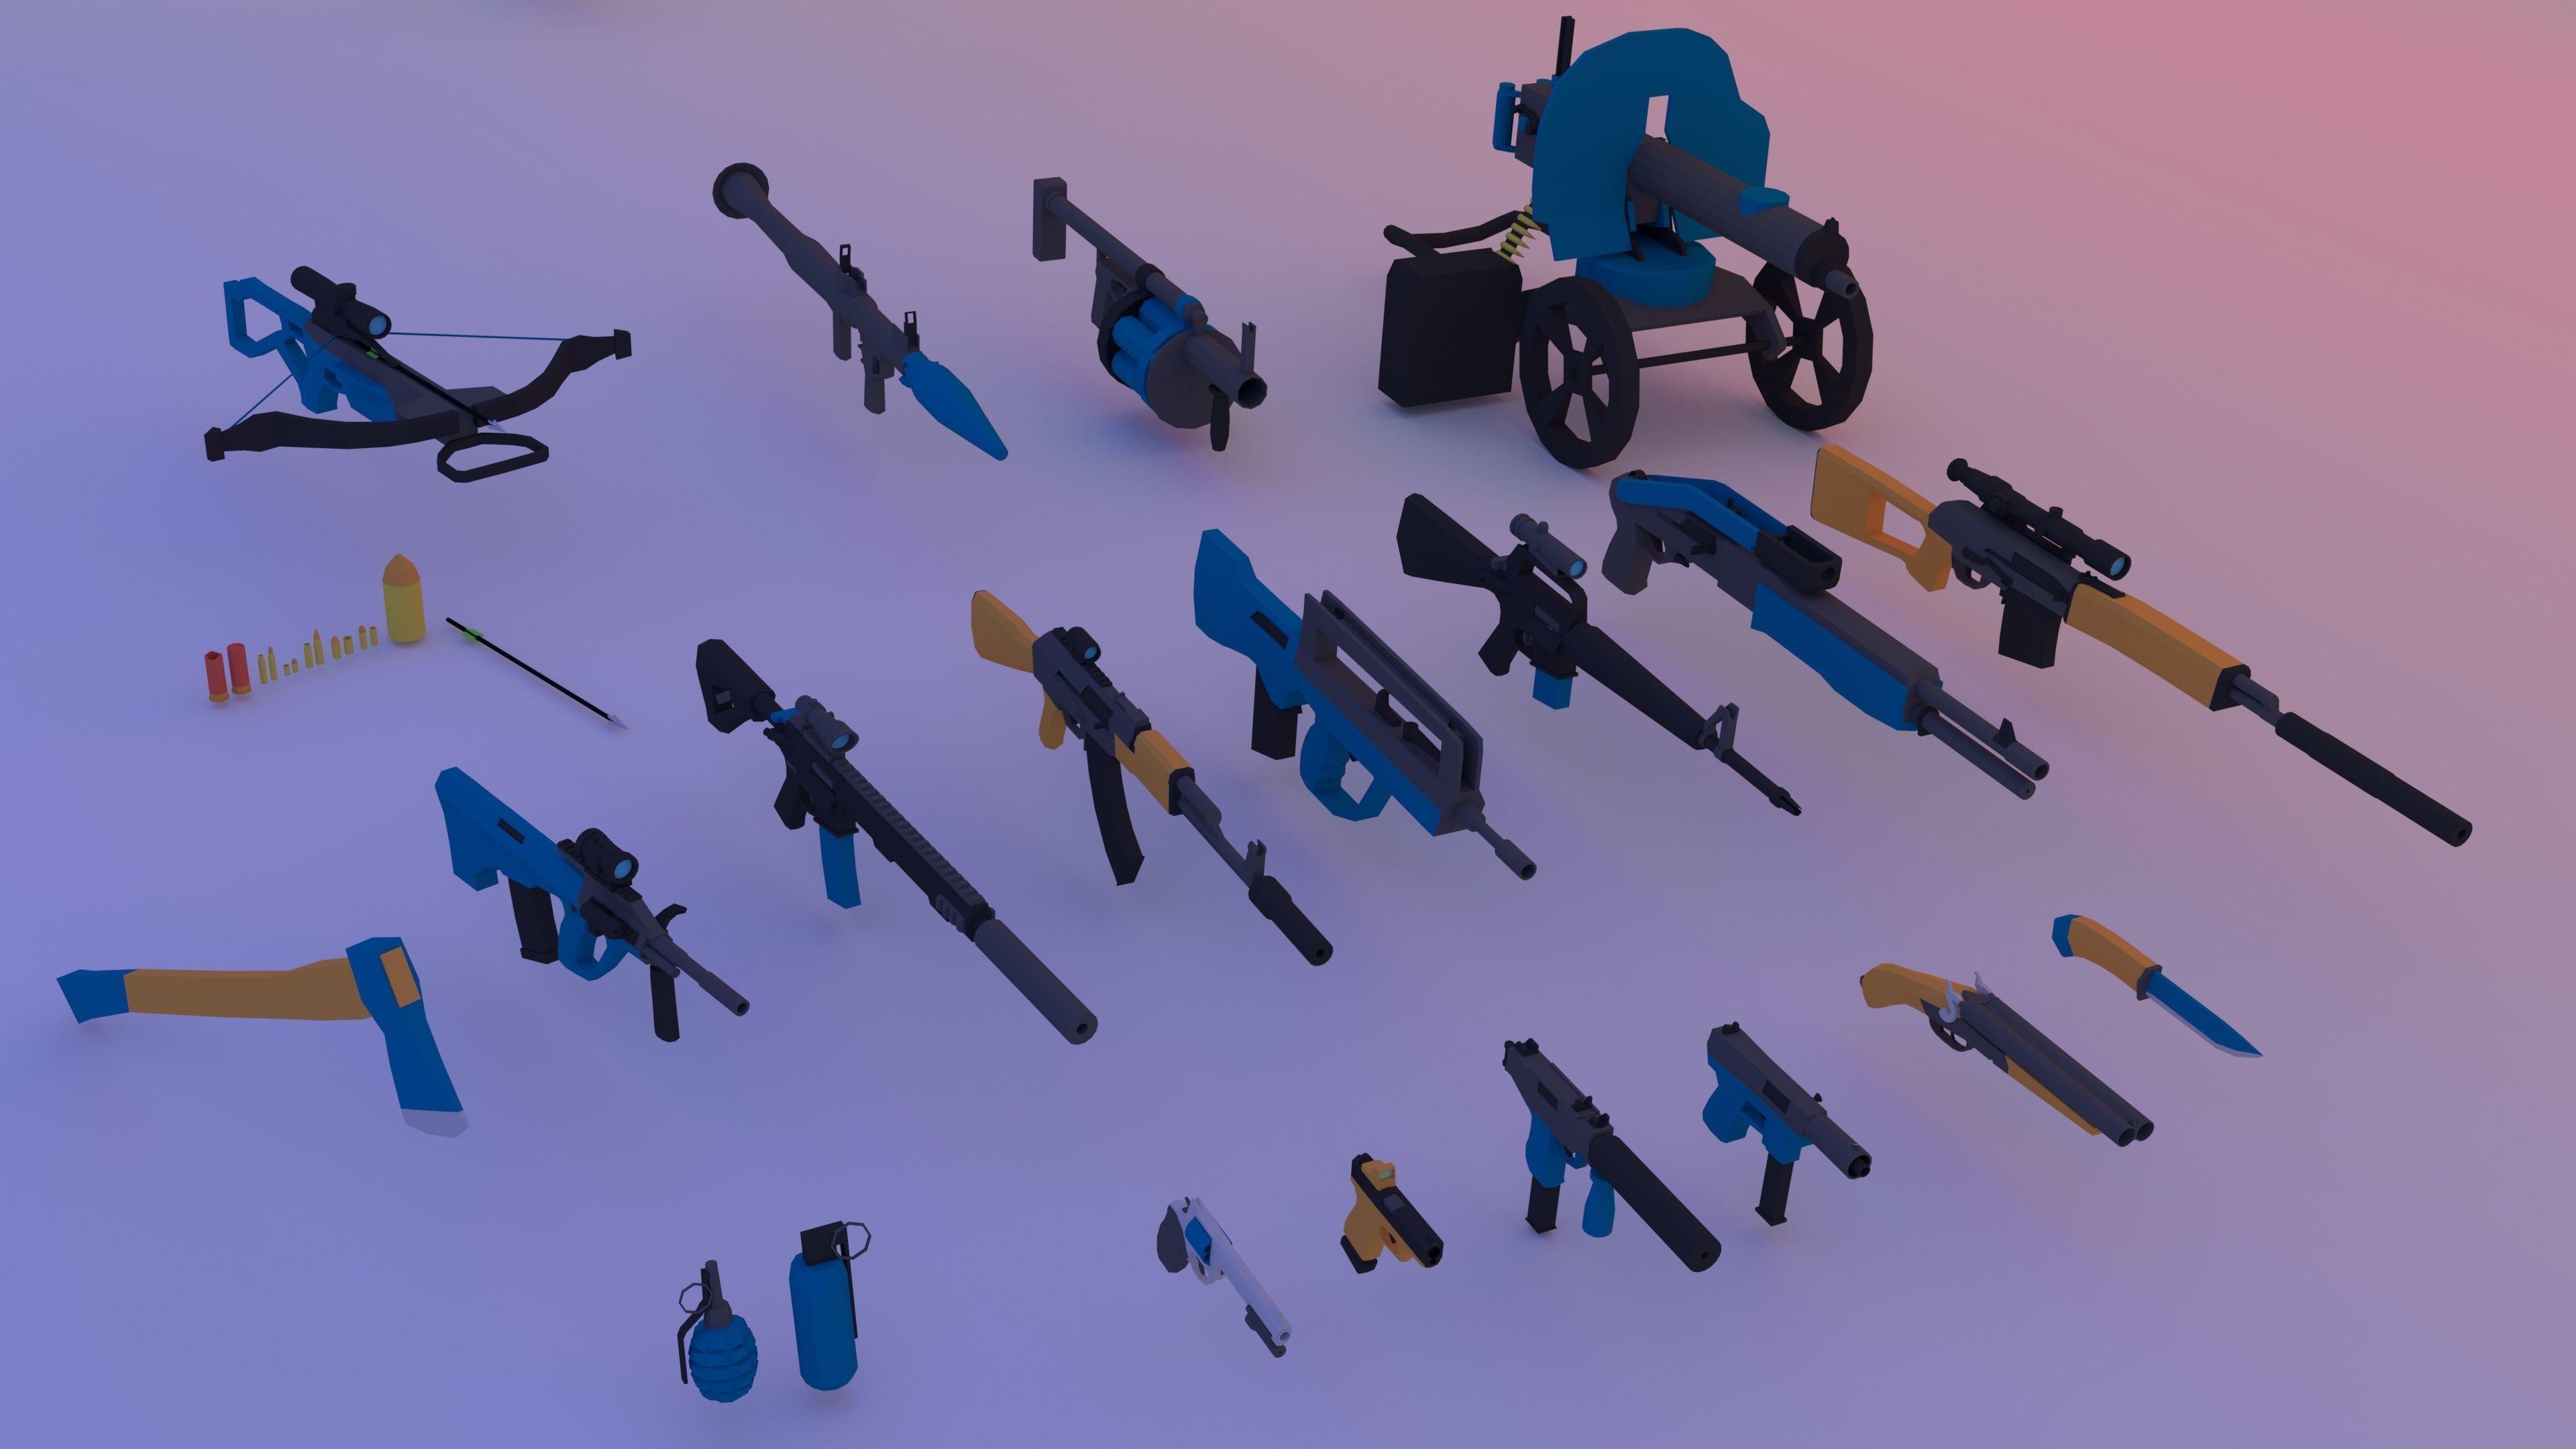 Low poly pack guns Animated - AK-47 - M16 - AR15 -UZI- 3D model